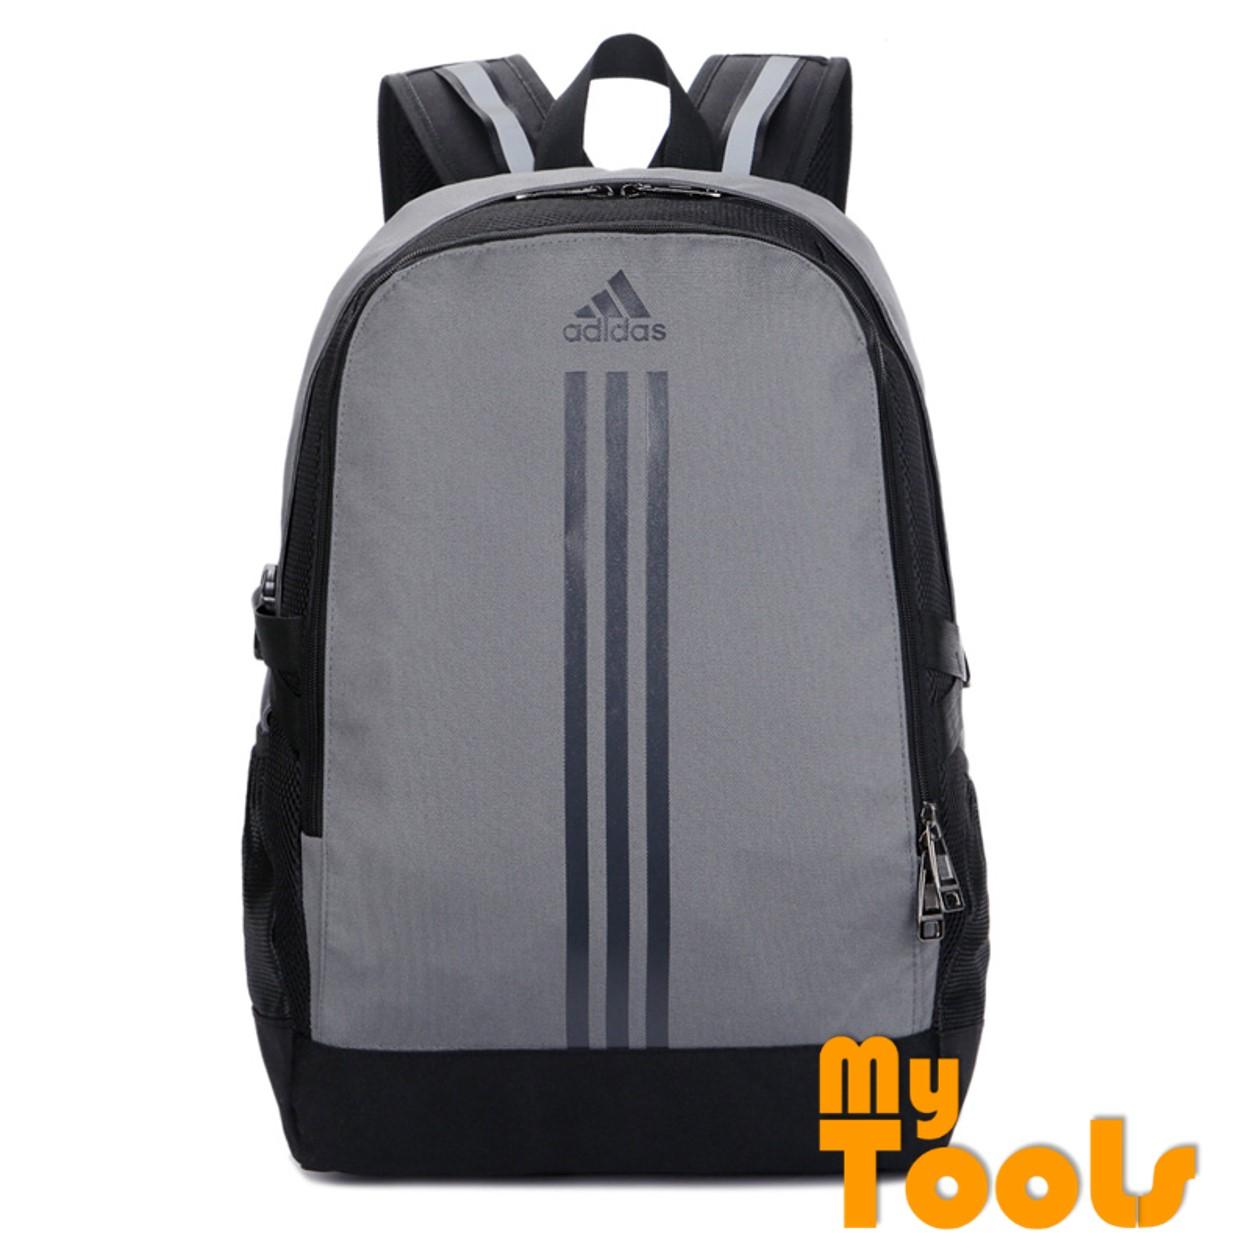 Adidas Stylish Fashion Sport Travel School Backpack Bag Top Logo